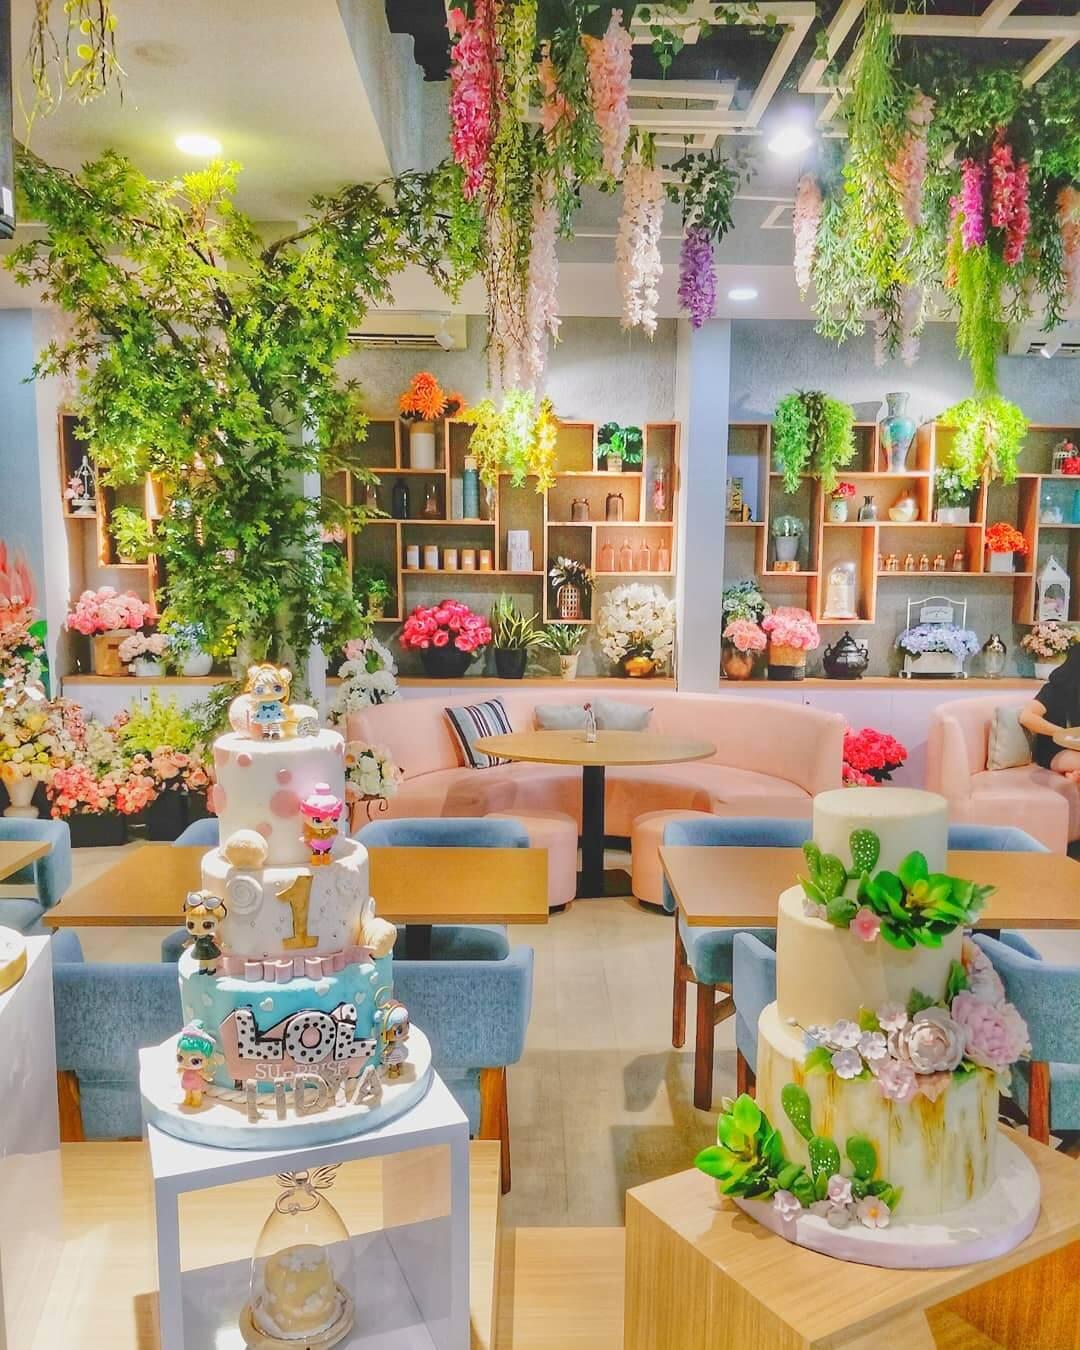 Billie Kitchen, Cafe Baru di Jakarta Barat